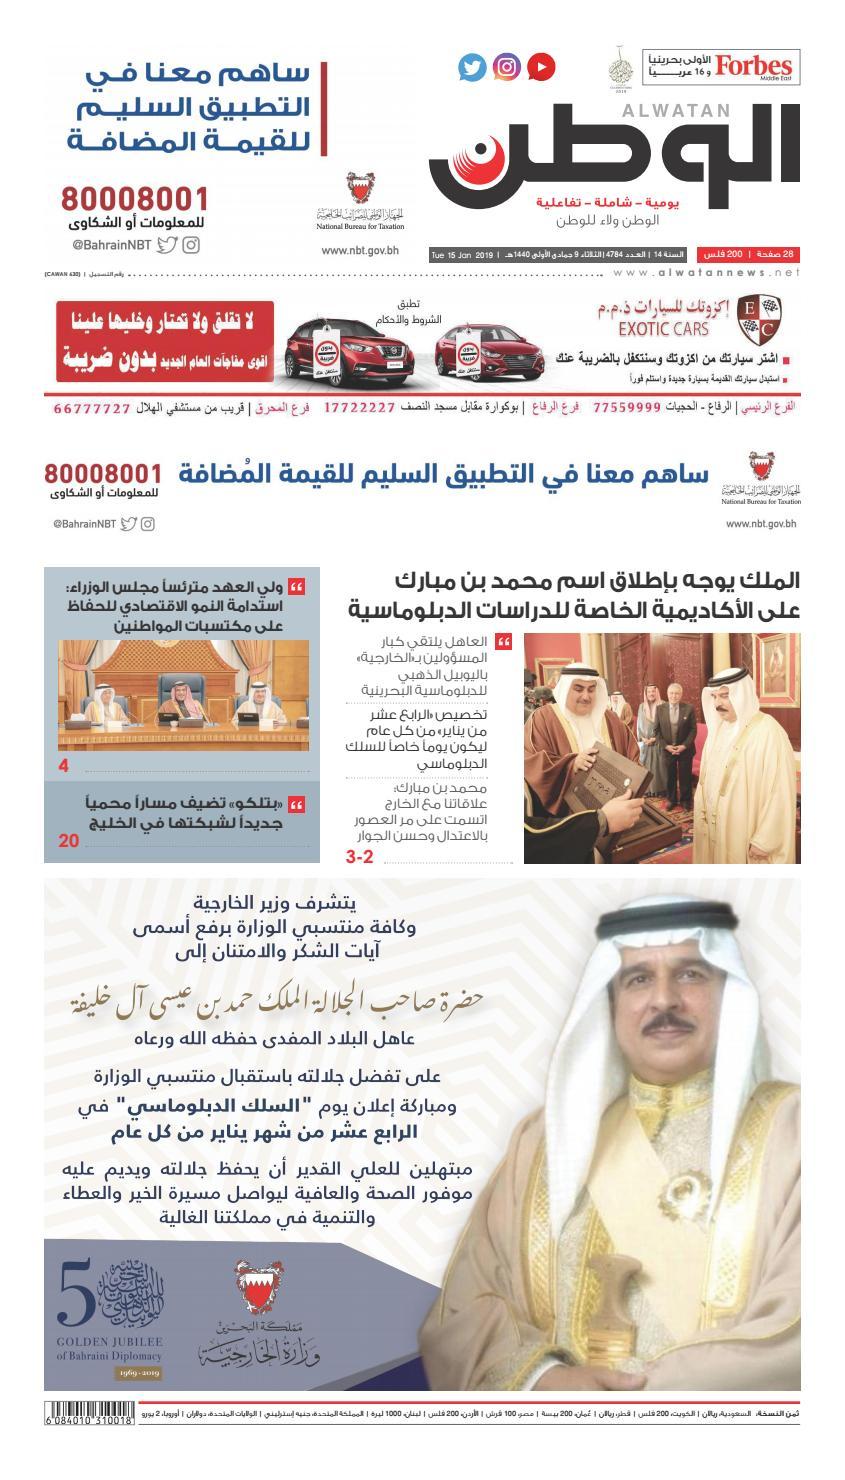 913a7d3ac Alwatan 15 JAN 2019 by Alwatan_BH - issuu